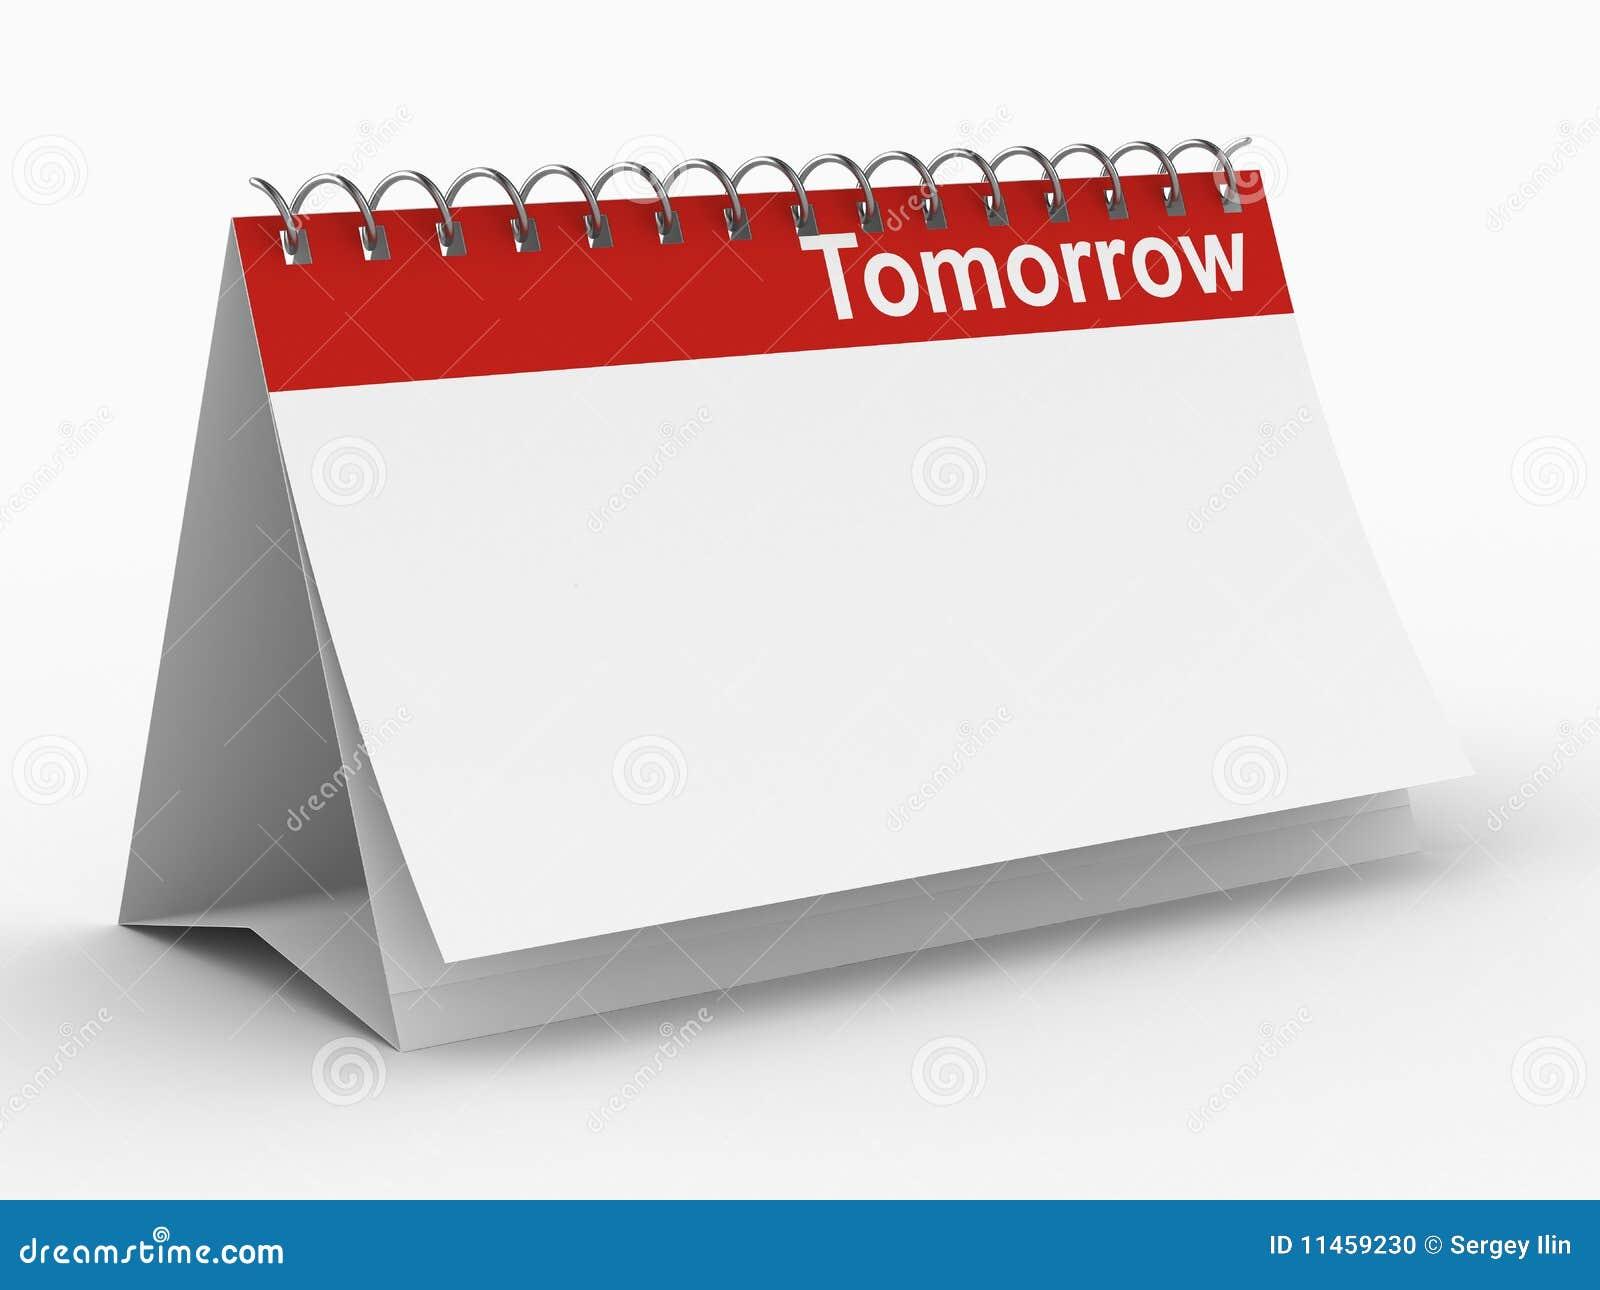 Calendar Notebook Design : Calendar for tomorrow on white background stock photo